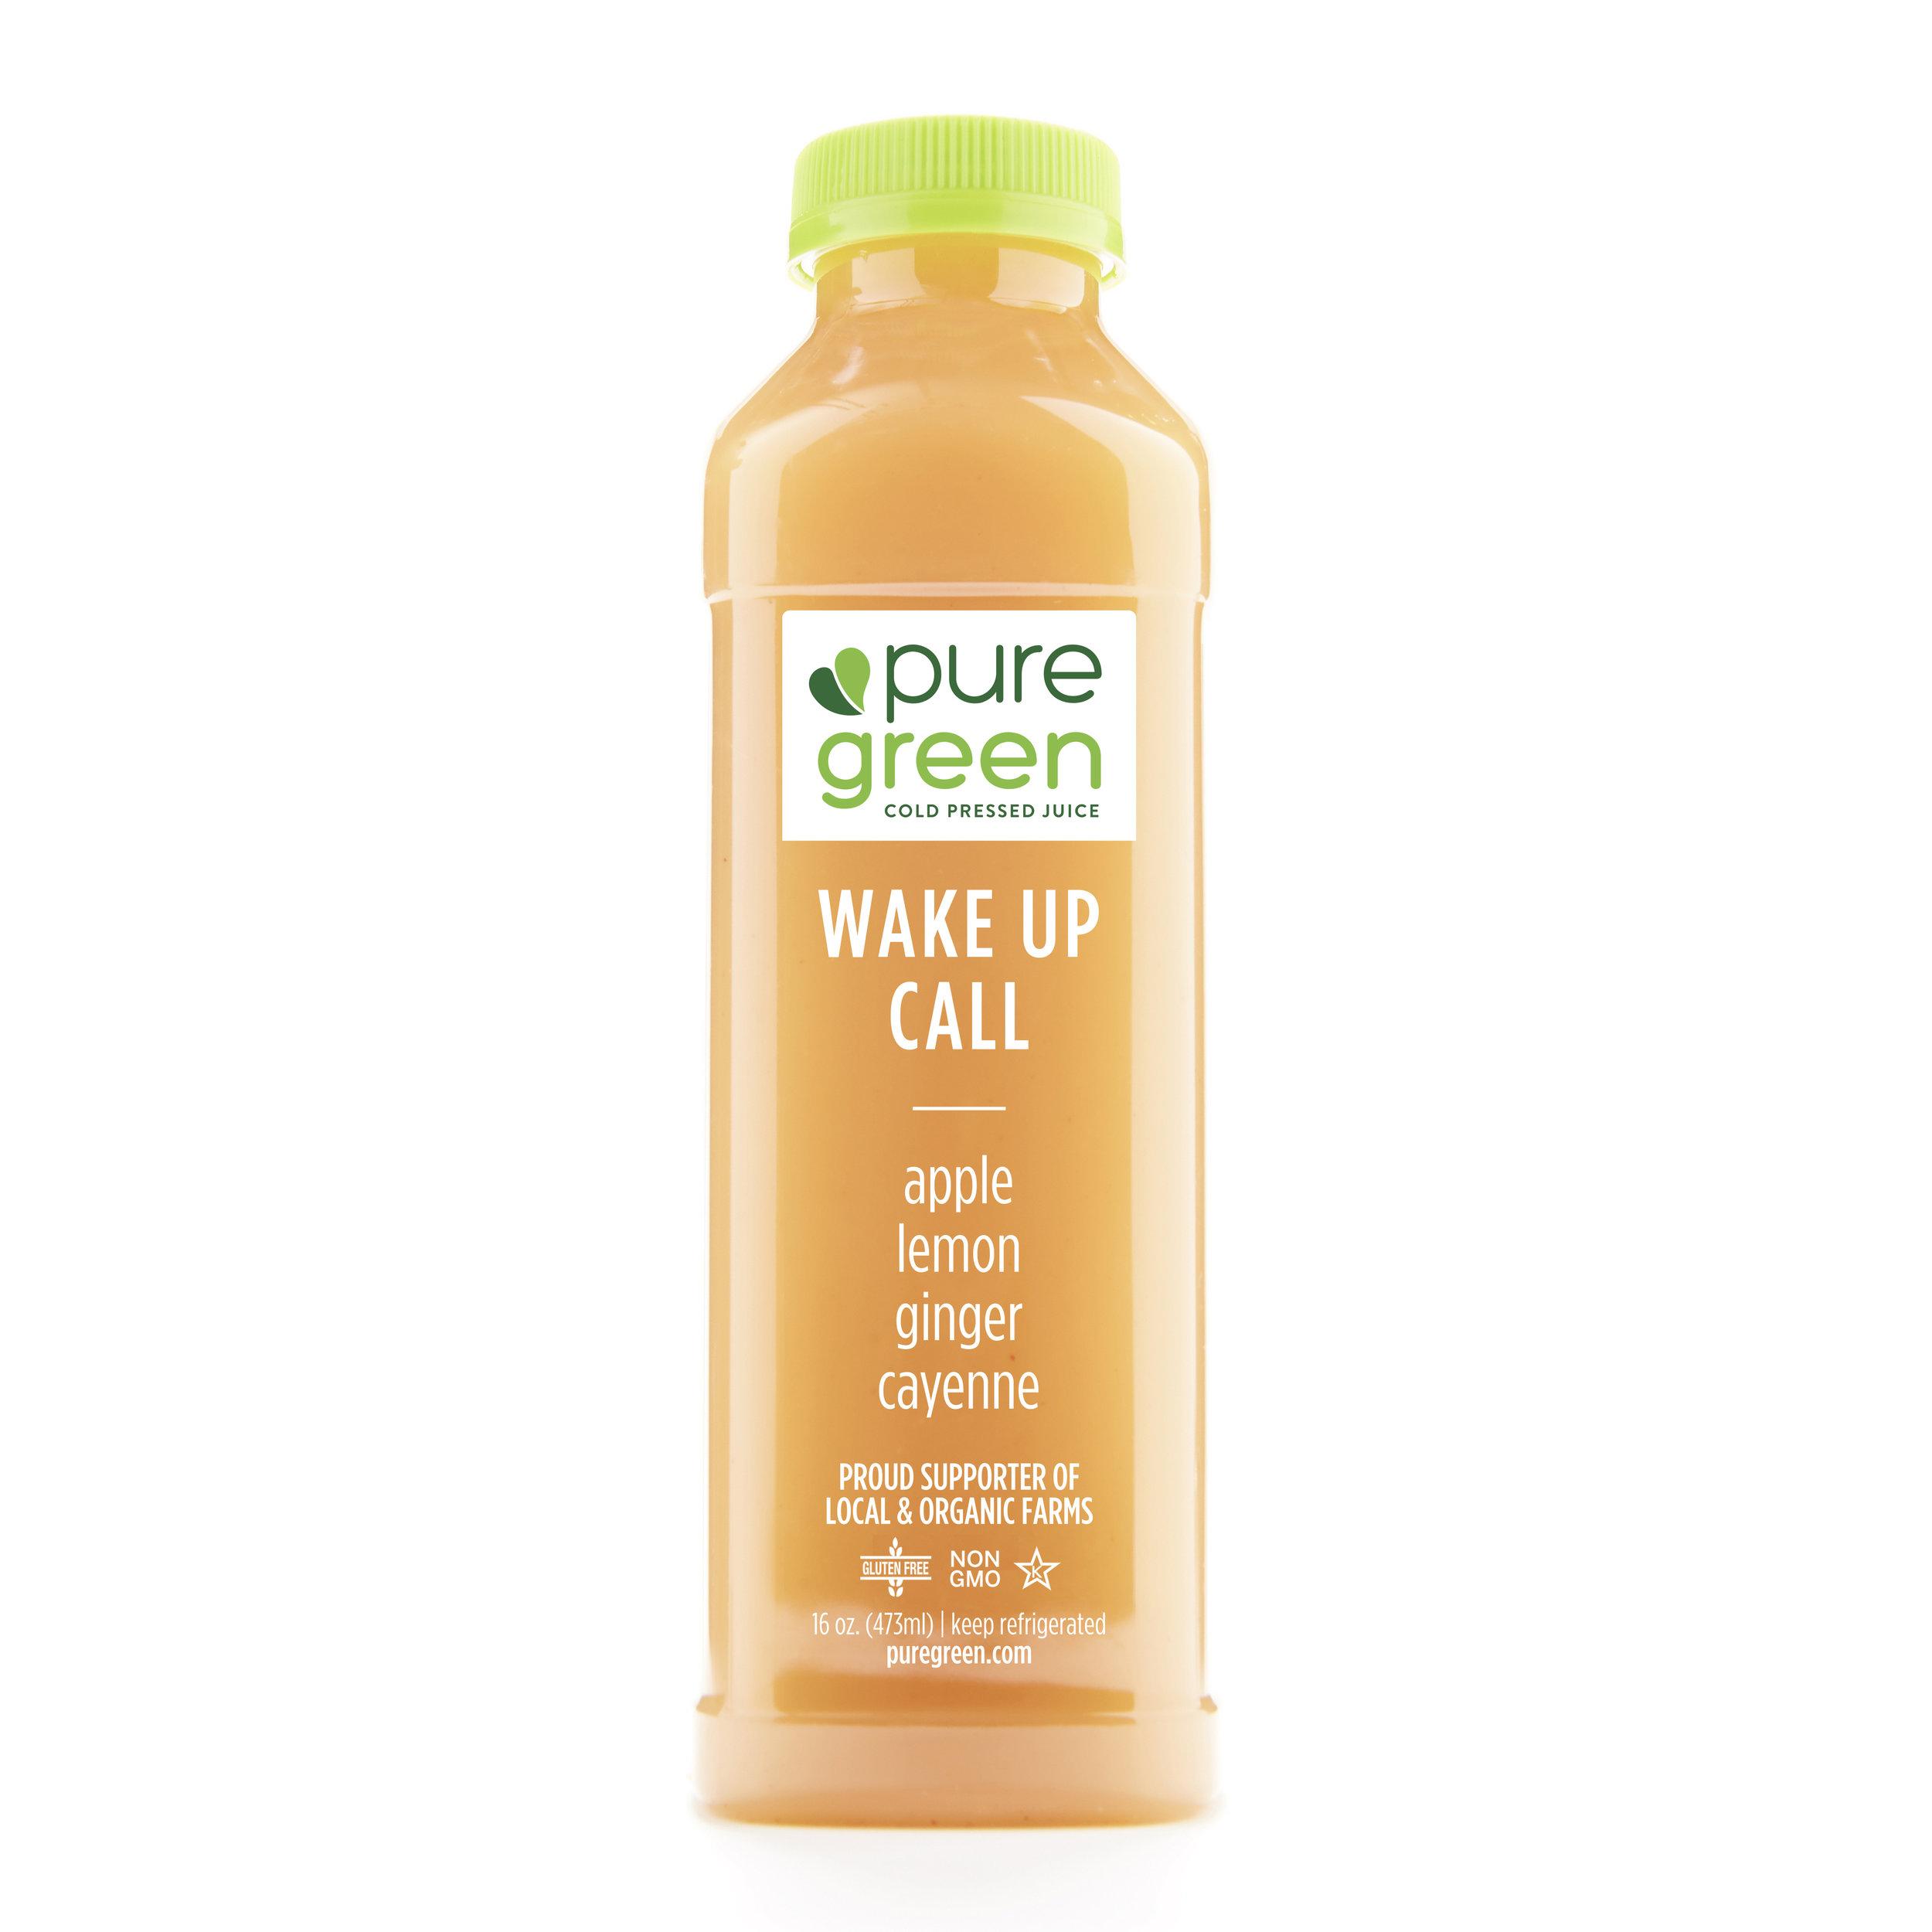 Wake Up Call 16oz Juice copy.jpg